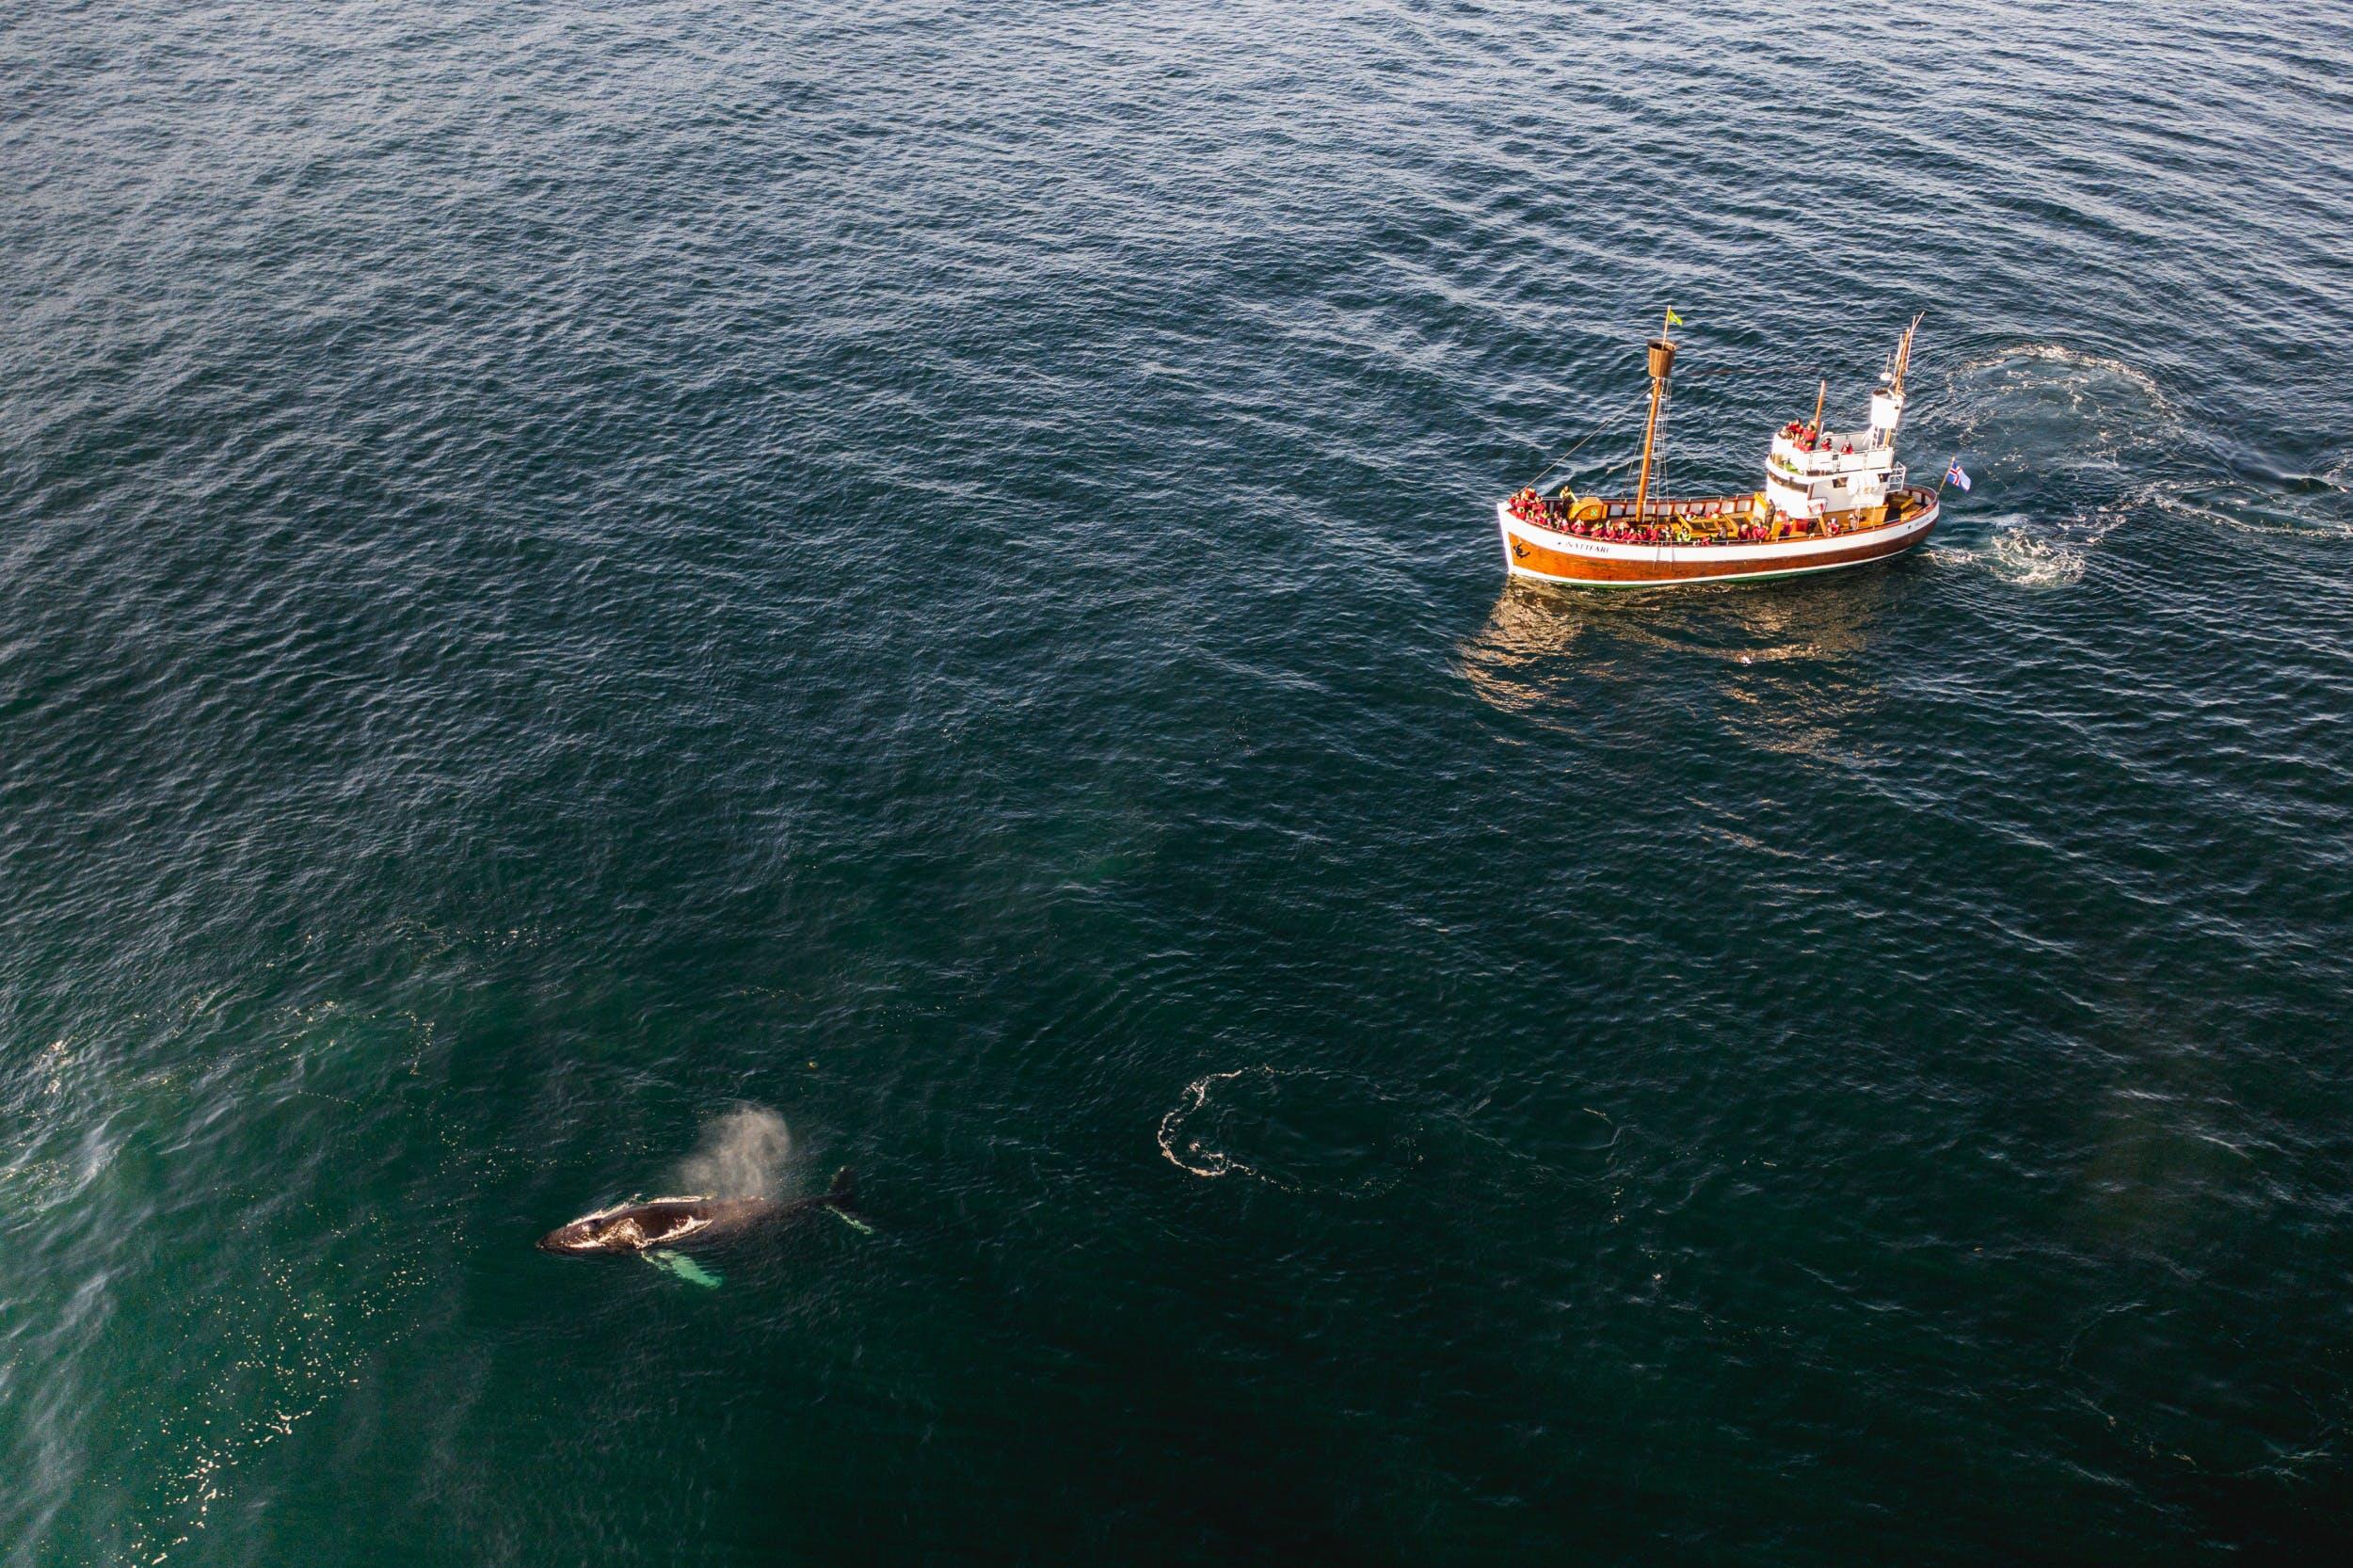 Whale watching boat by Húsavík